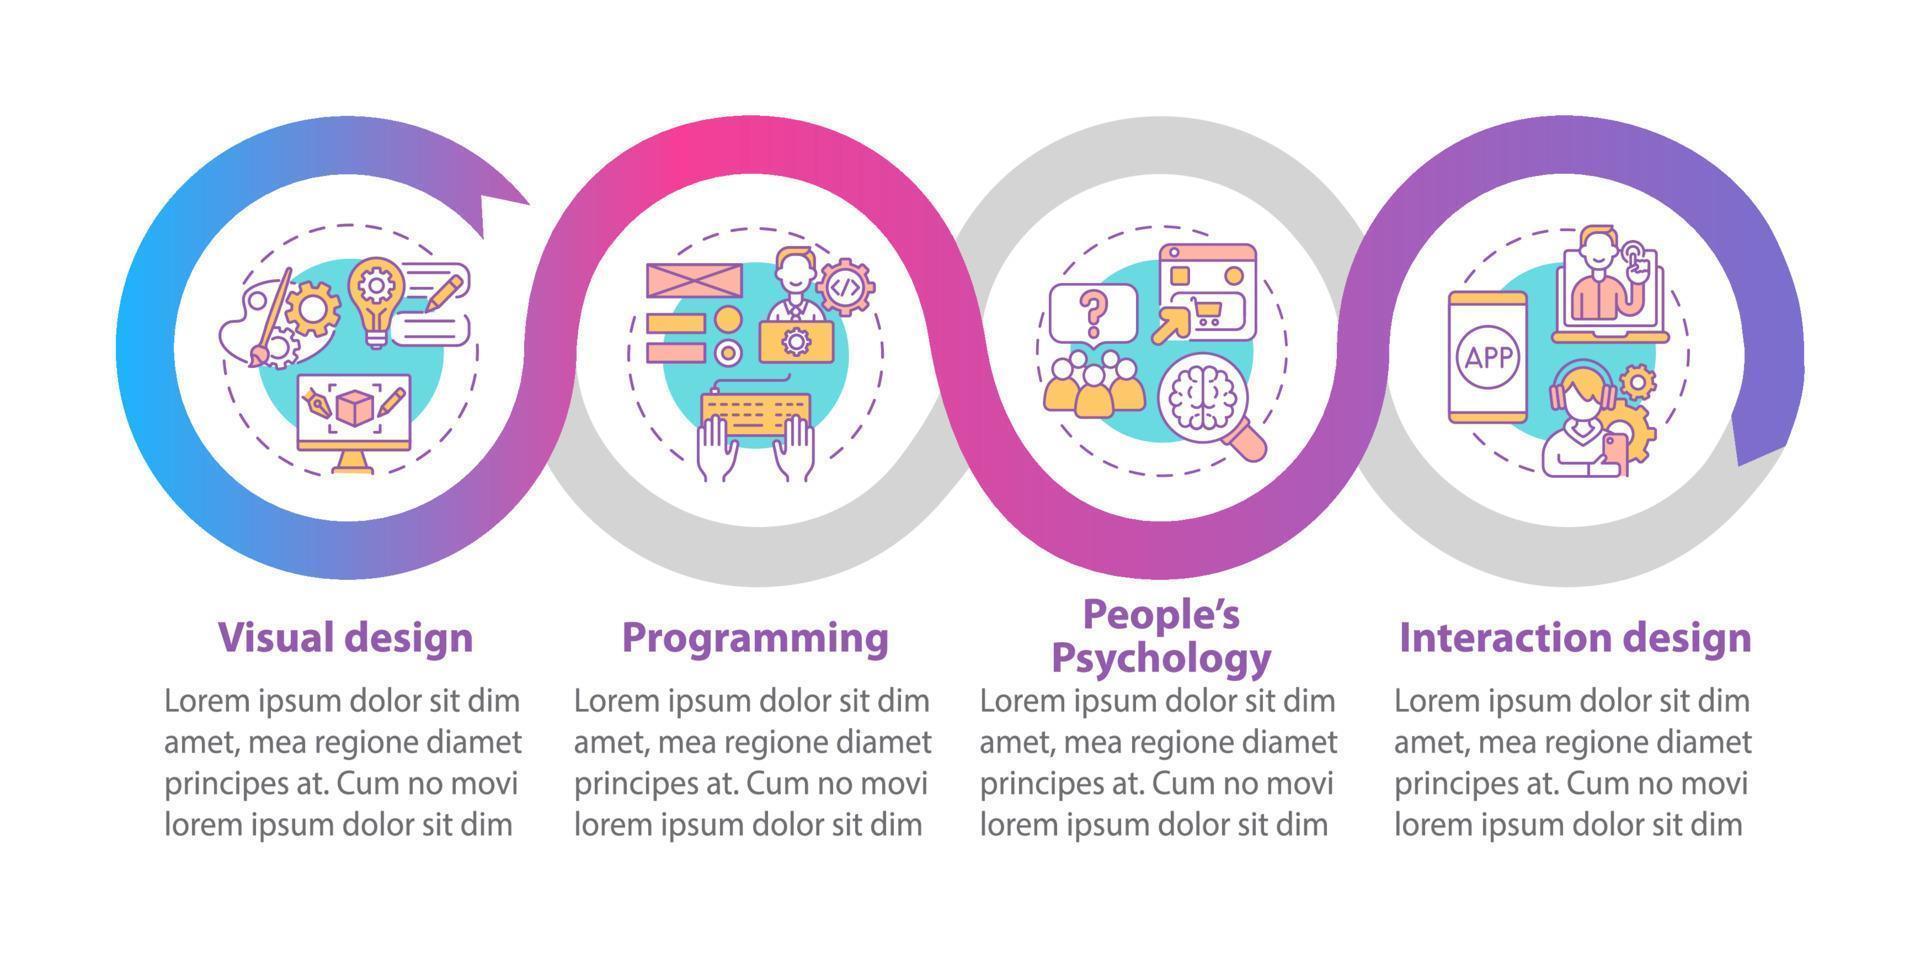 modelo de infográfico de vetor de design de produto